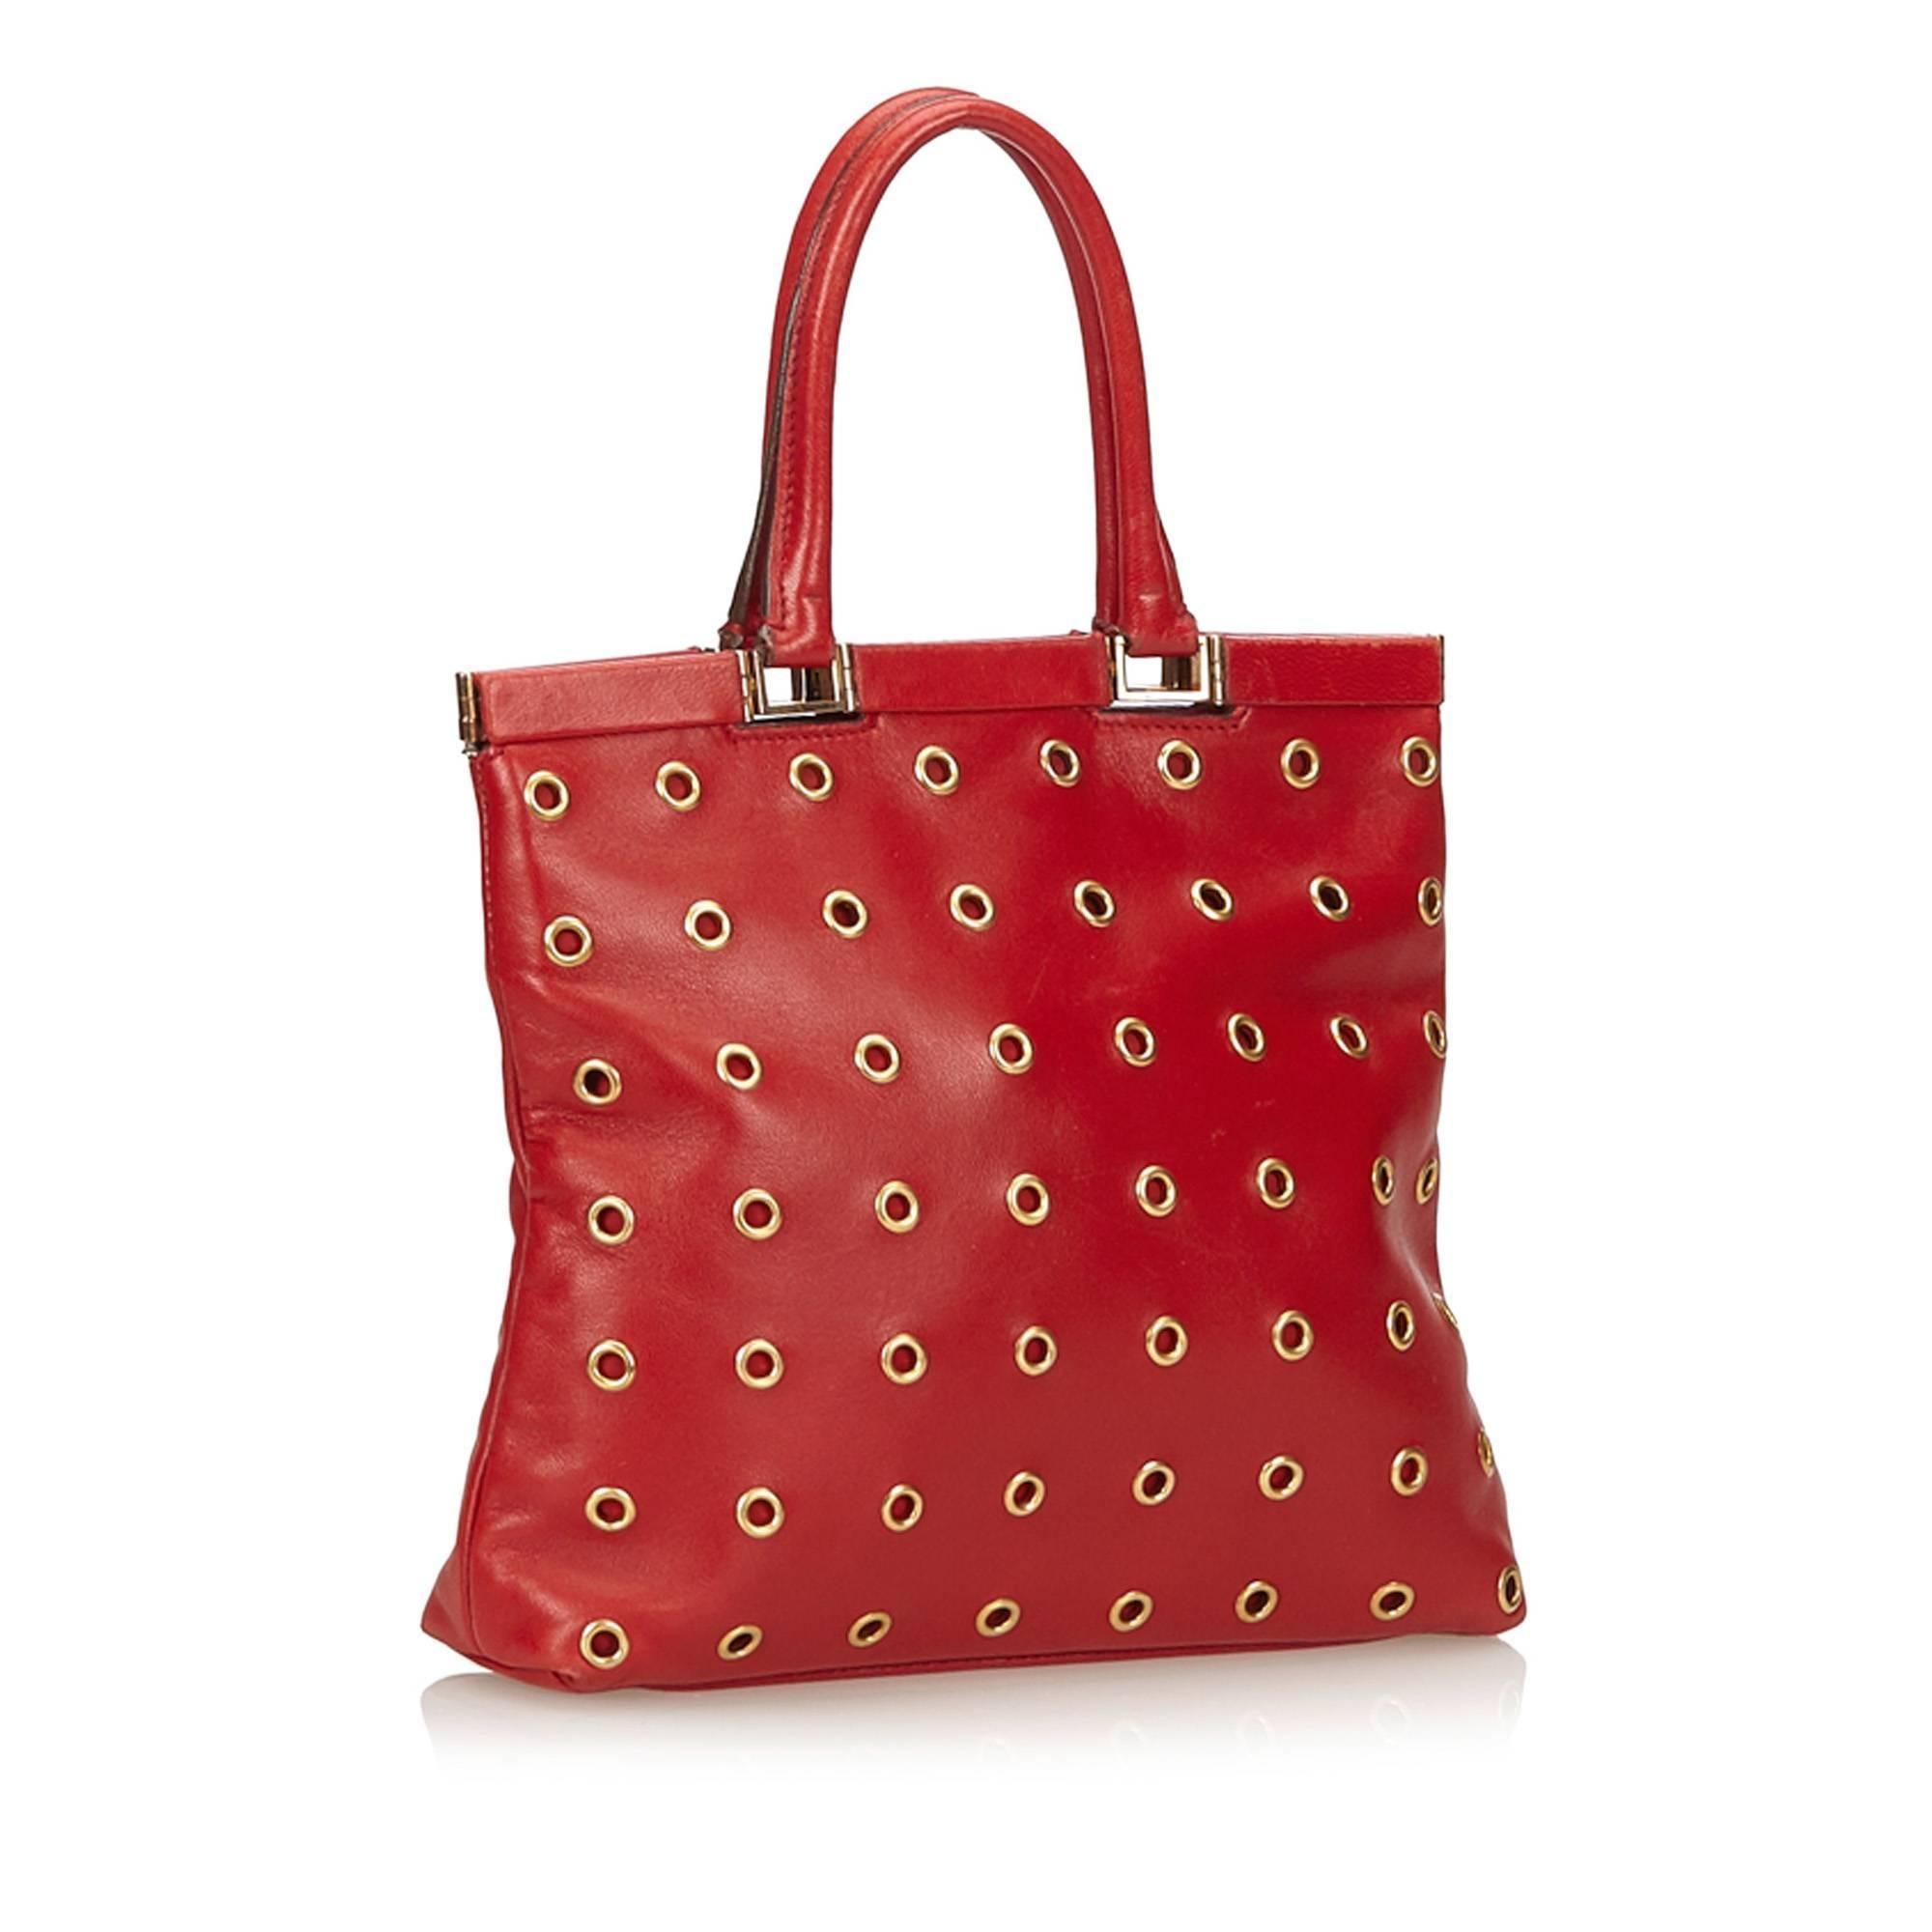 Prada Red Calf Leather 18 Carat Gold-Toned Eyelet Handbag For Sale at  1stdibs 047f89cbaf26d